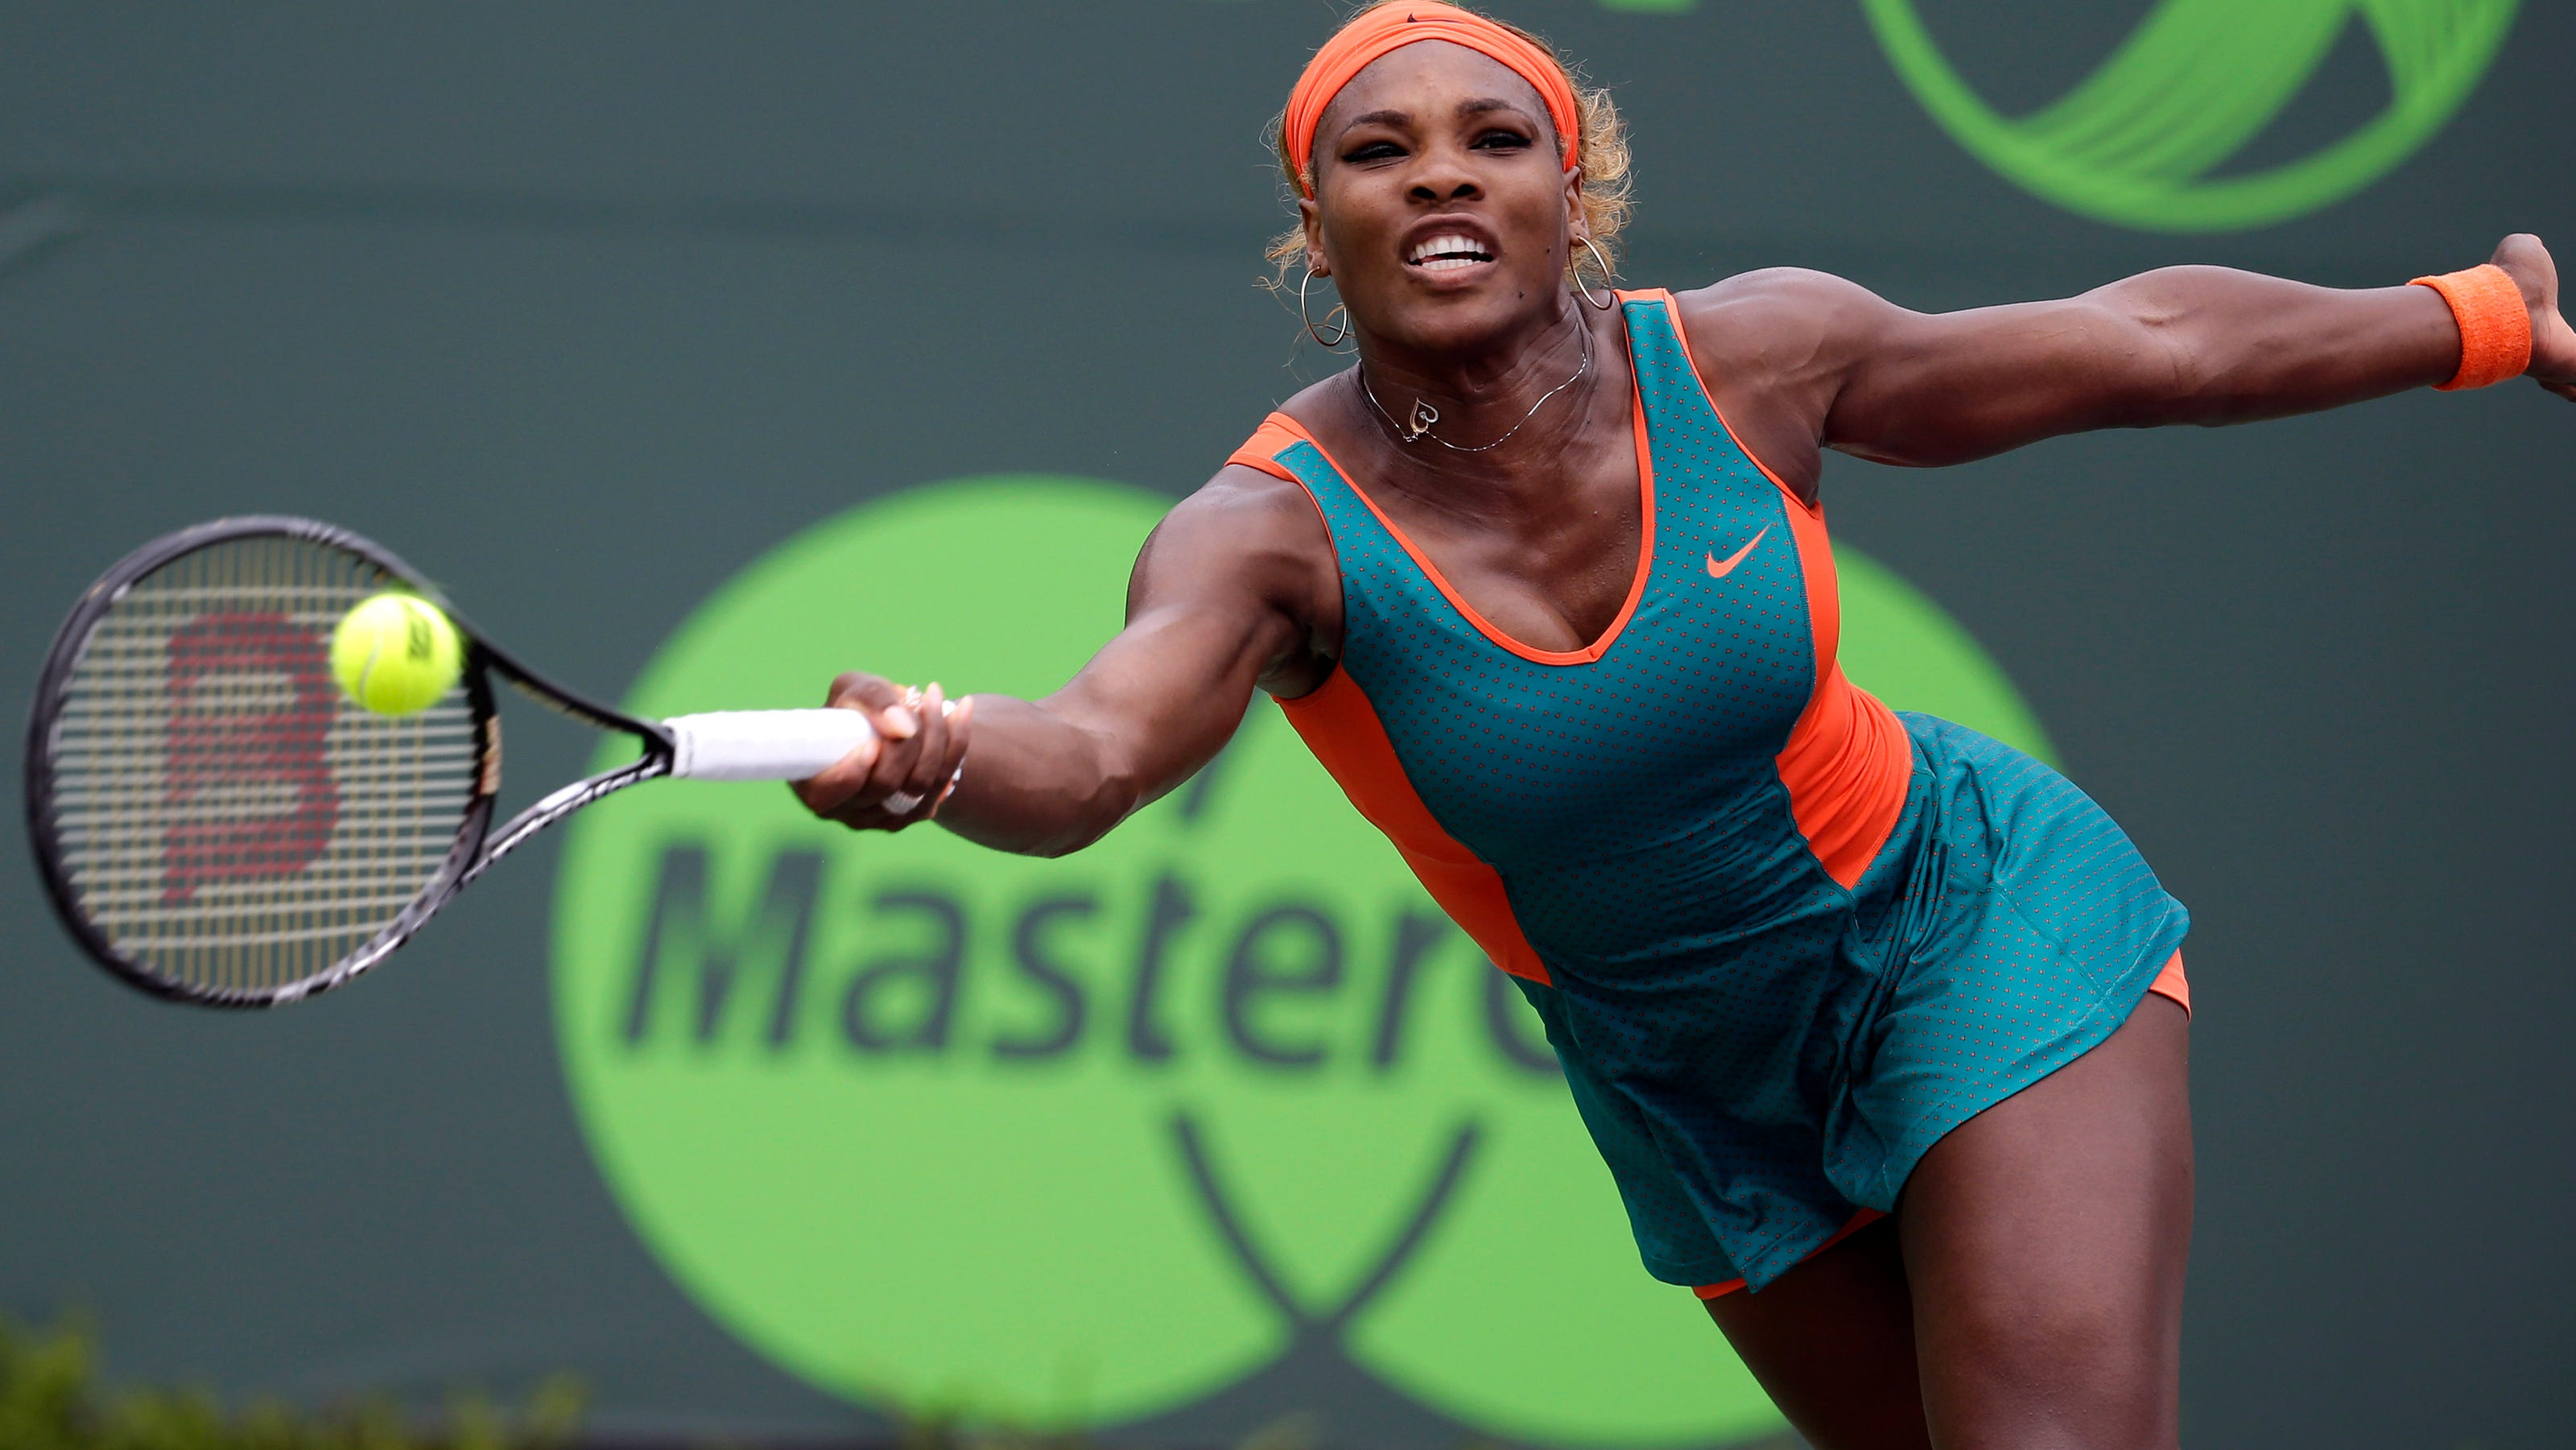 Serena Williams beats Li Na to win WTA Championships - BBC